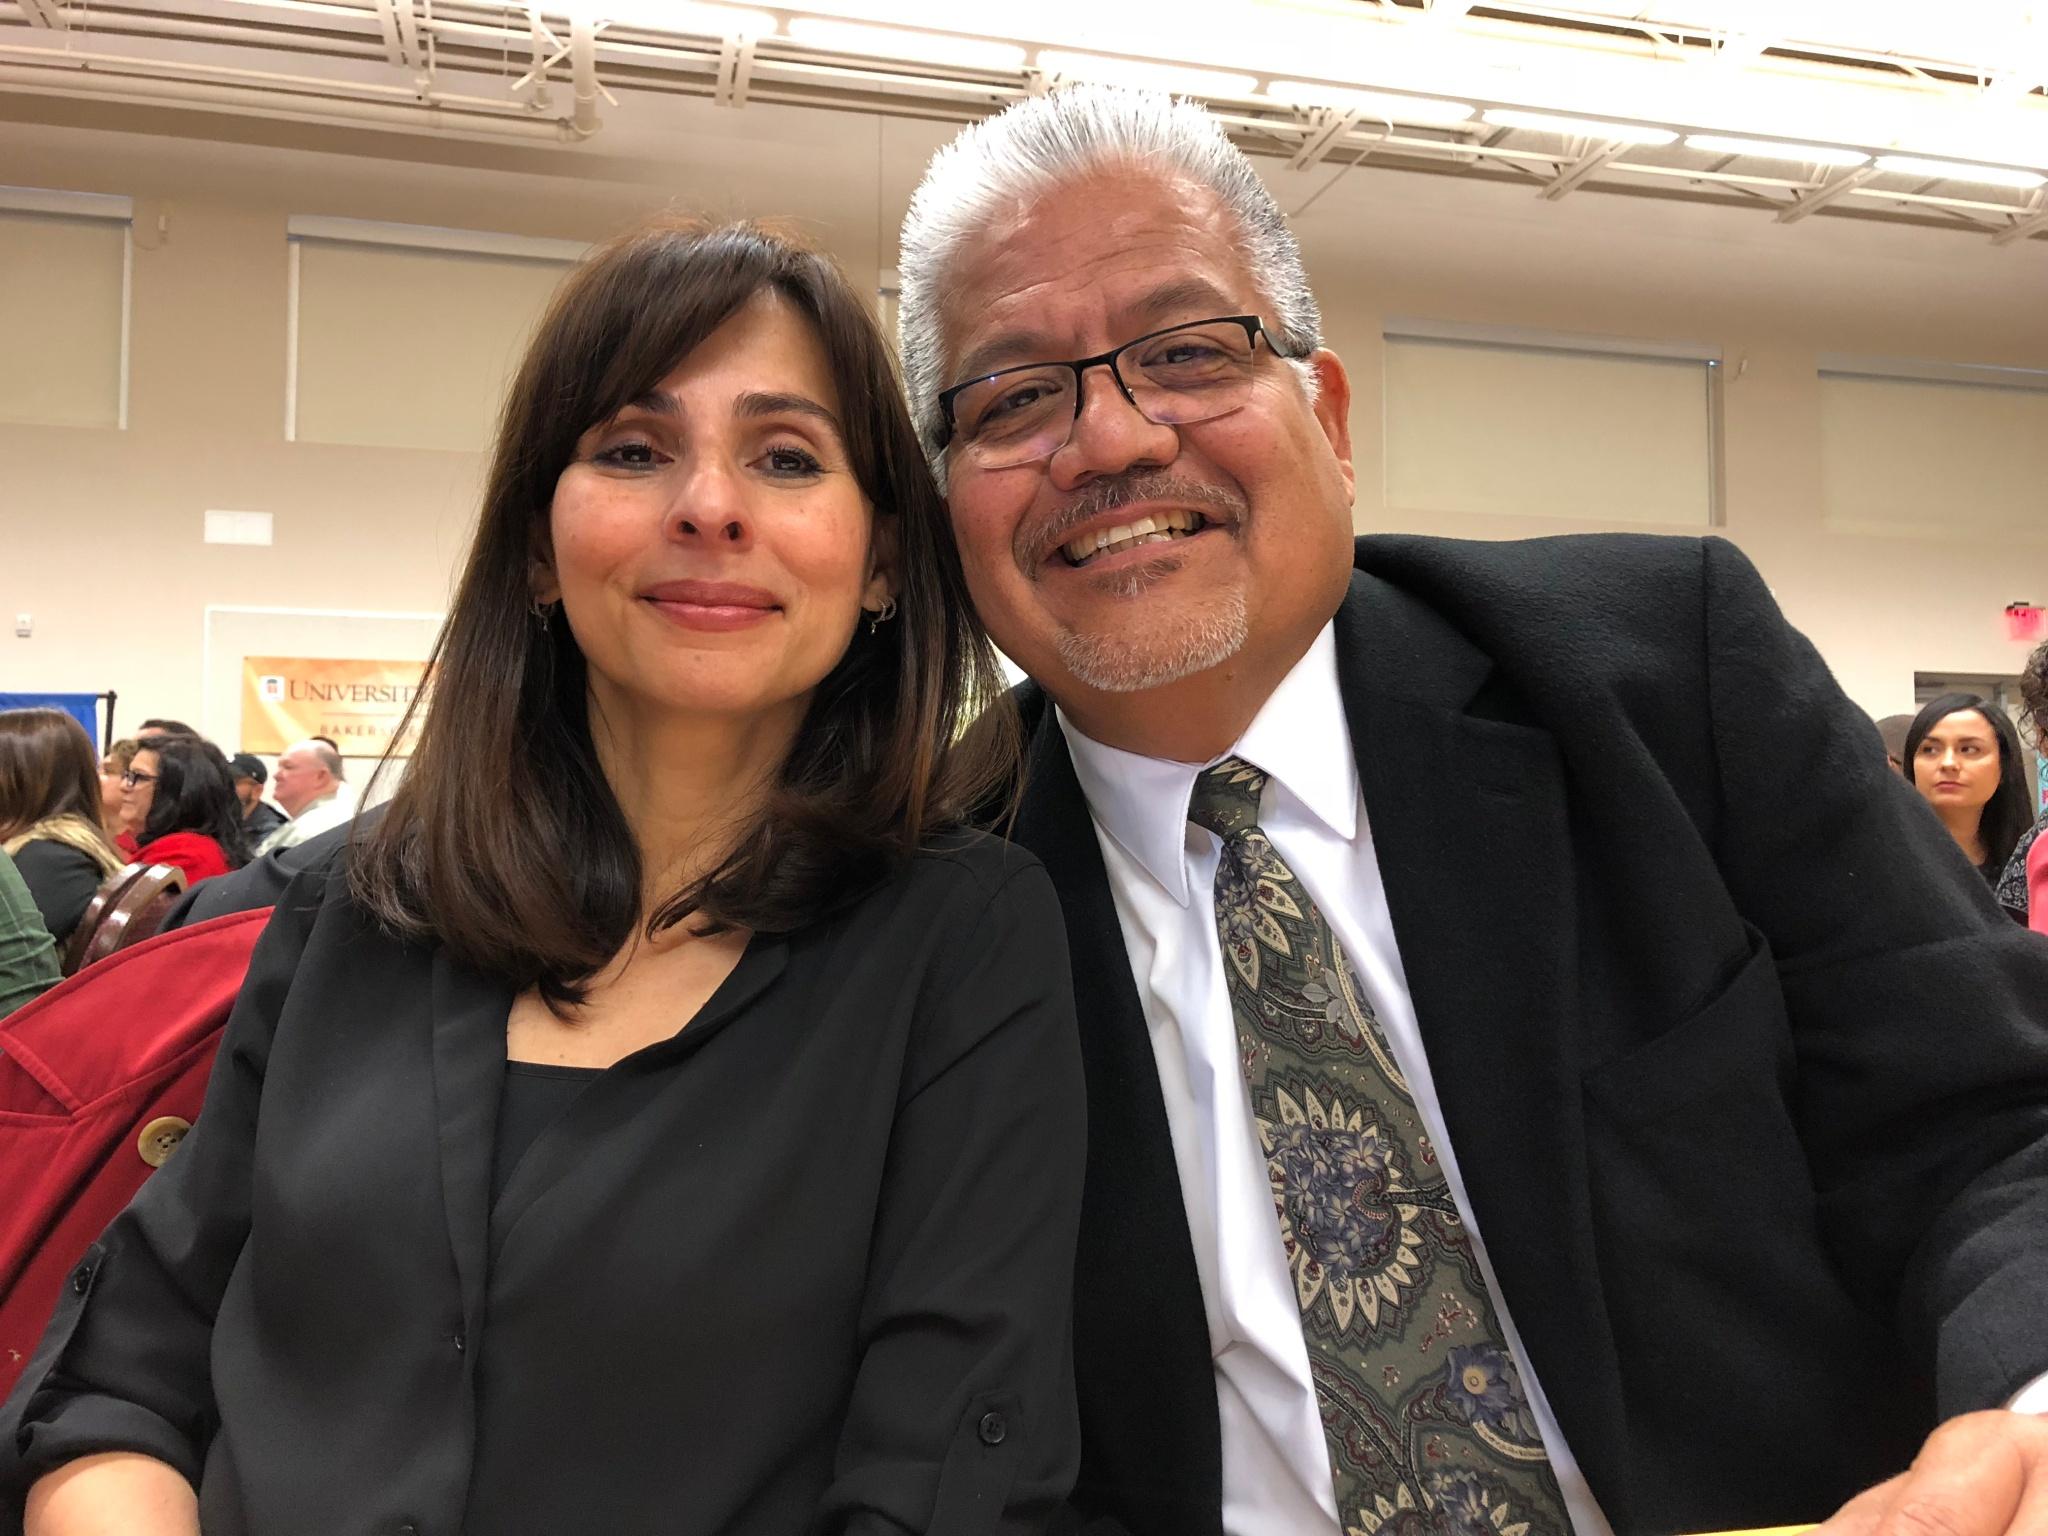 Corny Rodriguez, Sonya Christian March 23 2018